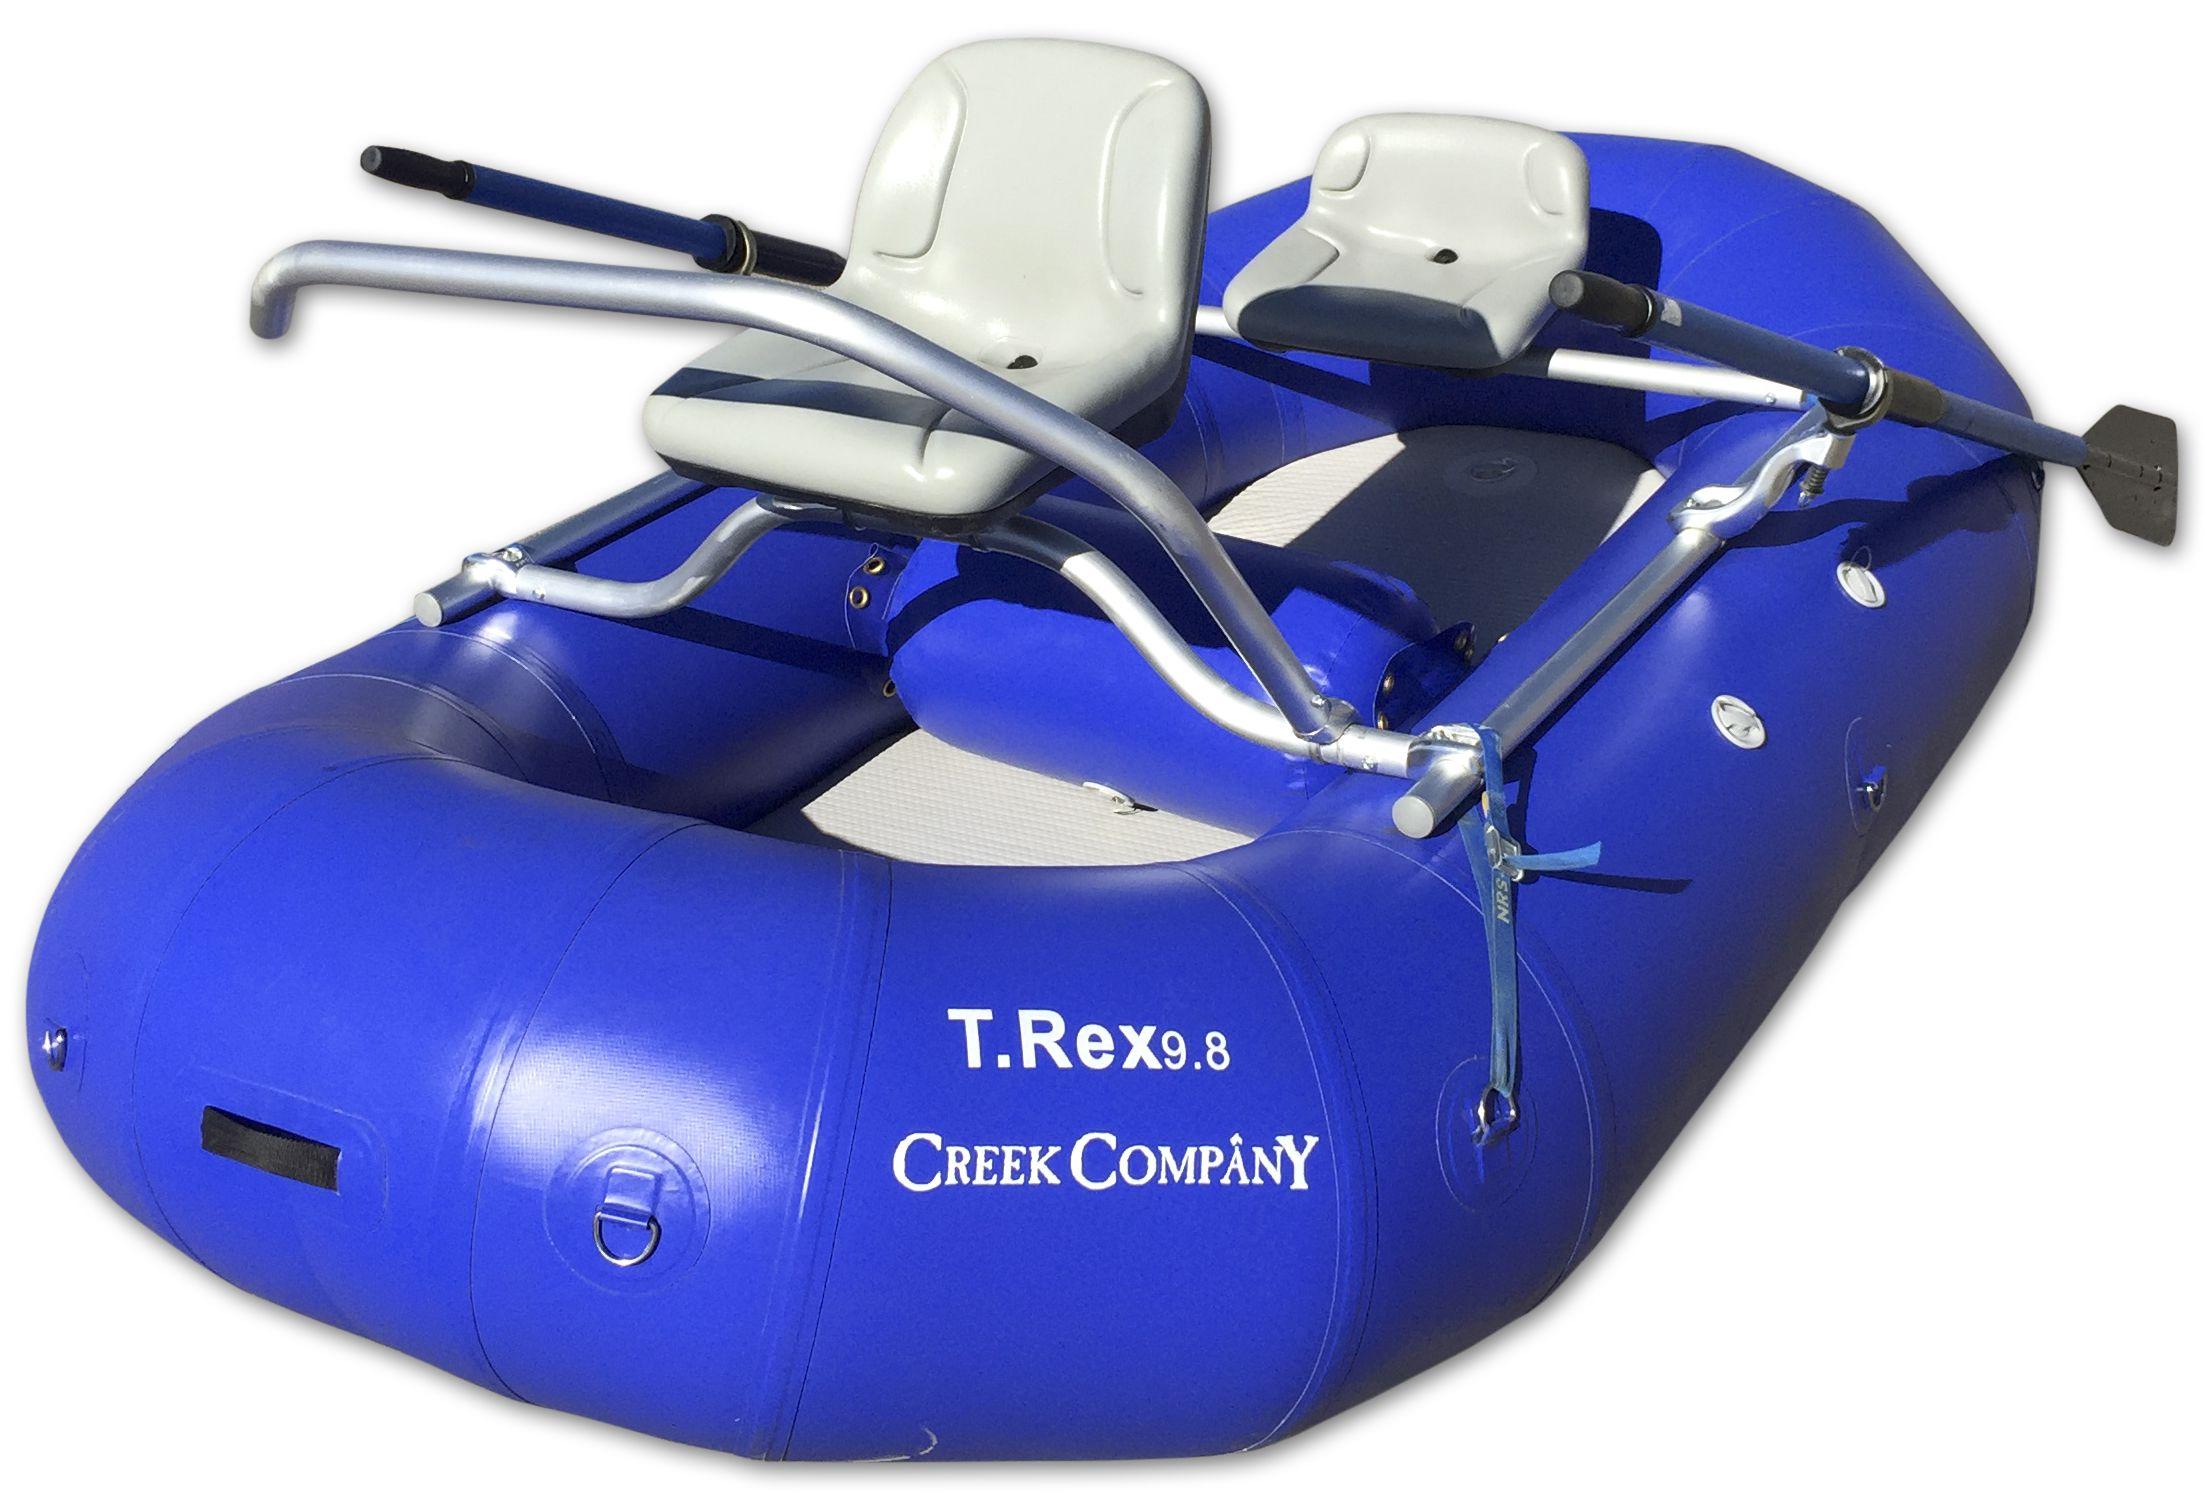 The creek company t rex raft 980 t rex 9 8 mini for Fly fishing raft